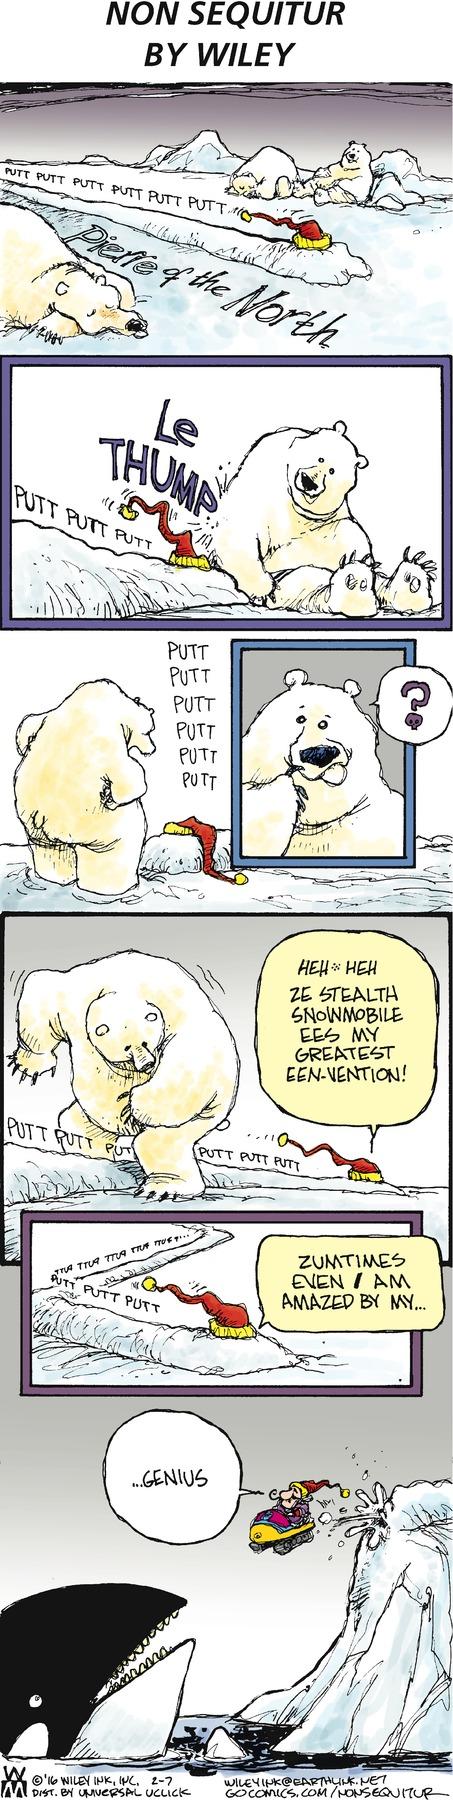 Non Sequitur Comic Strip for February 07, 2016